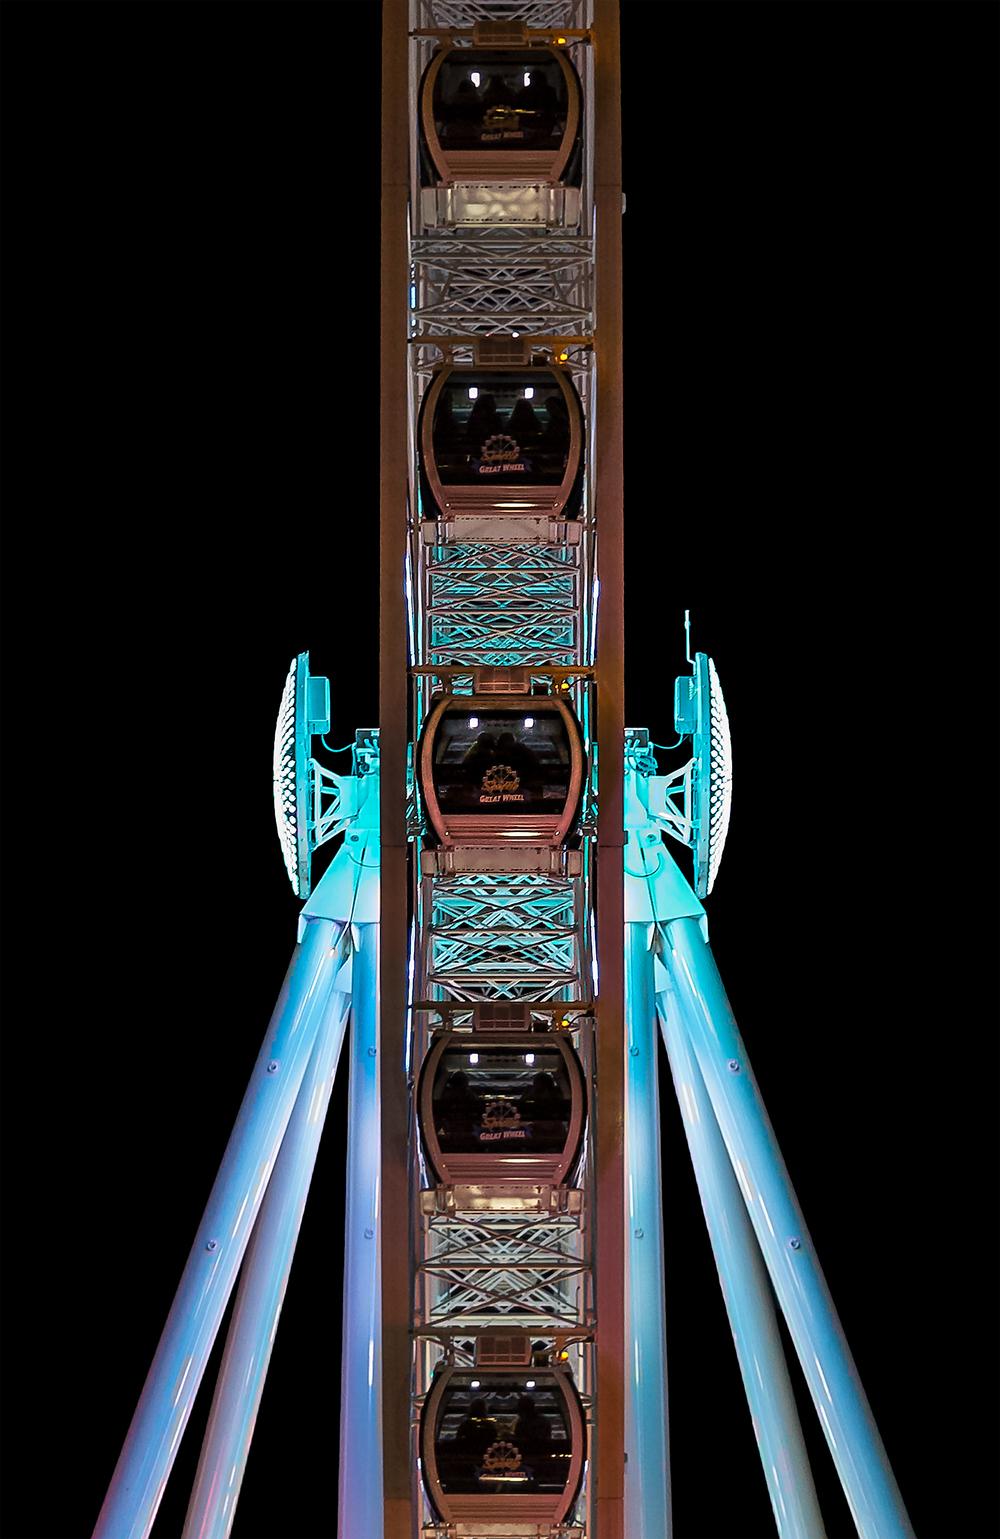 Ferris-Wheel-11x17-for-show.jpg